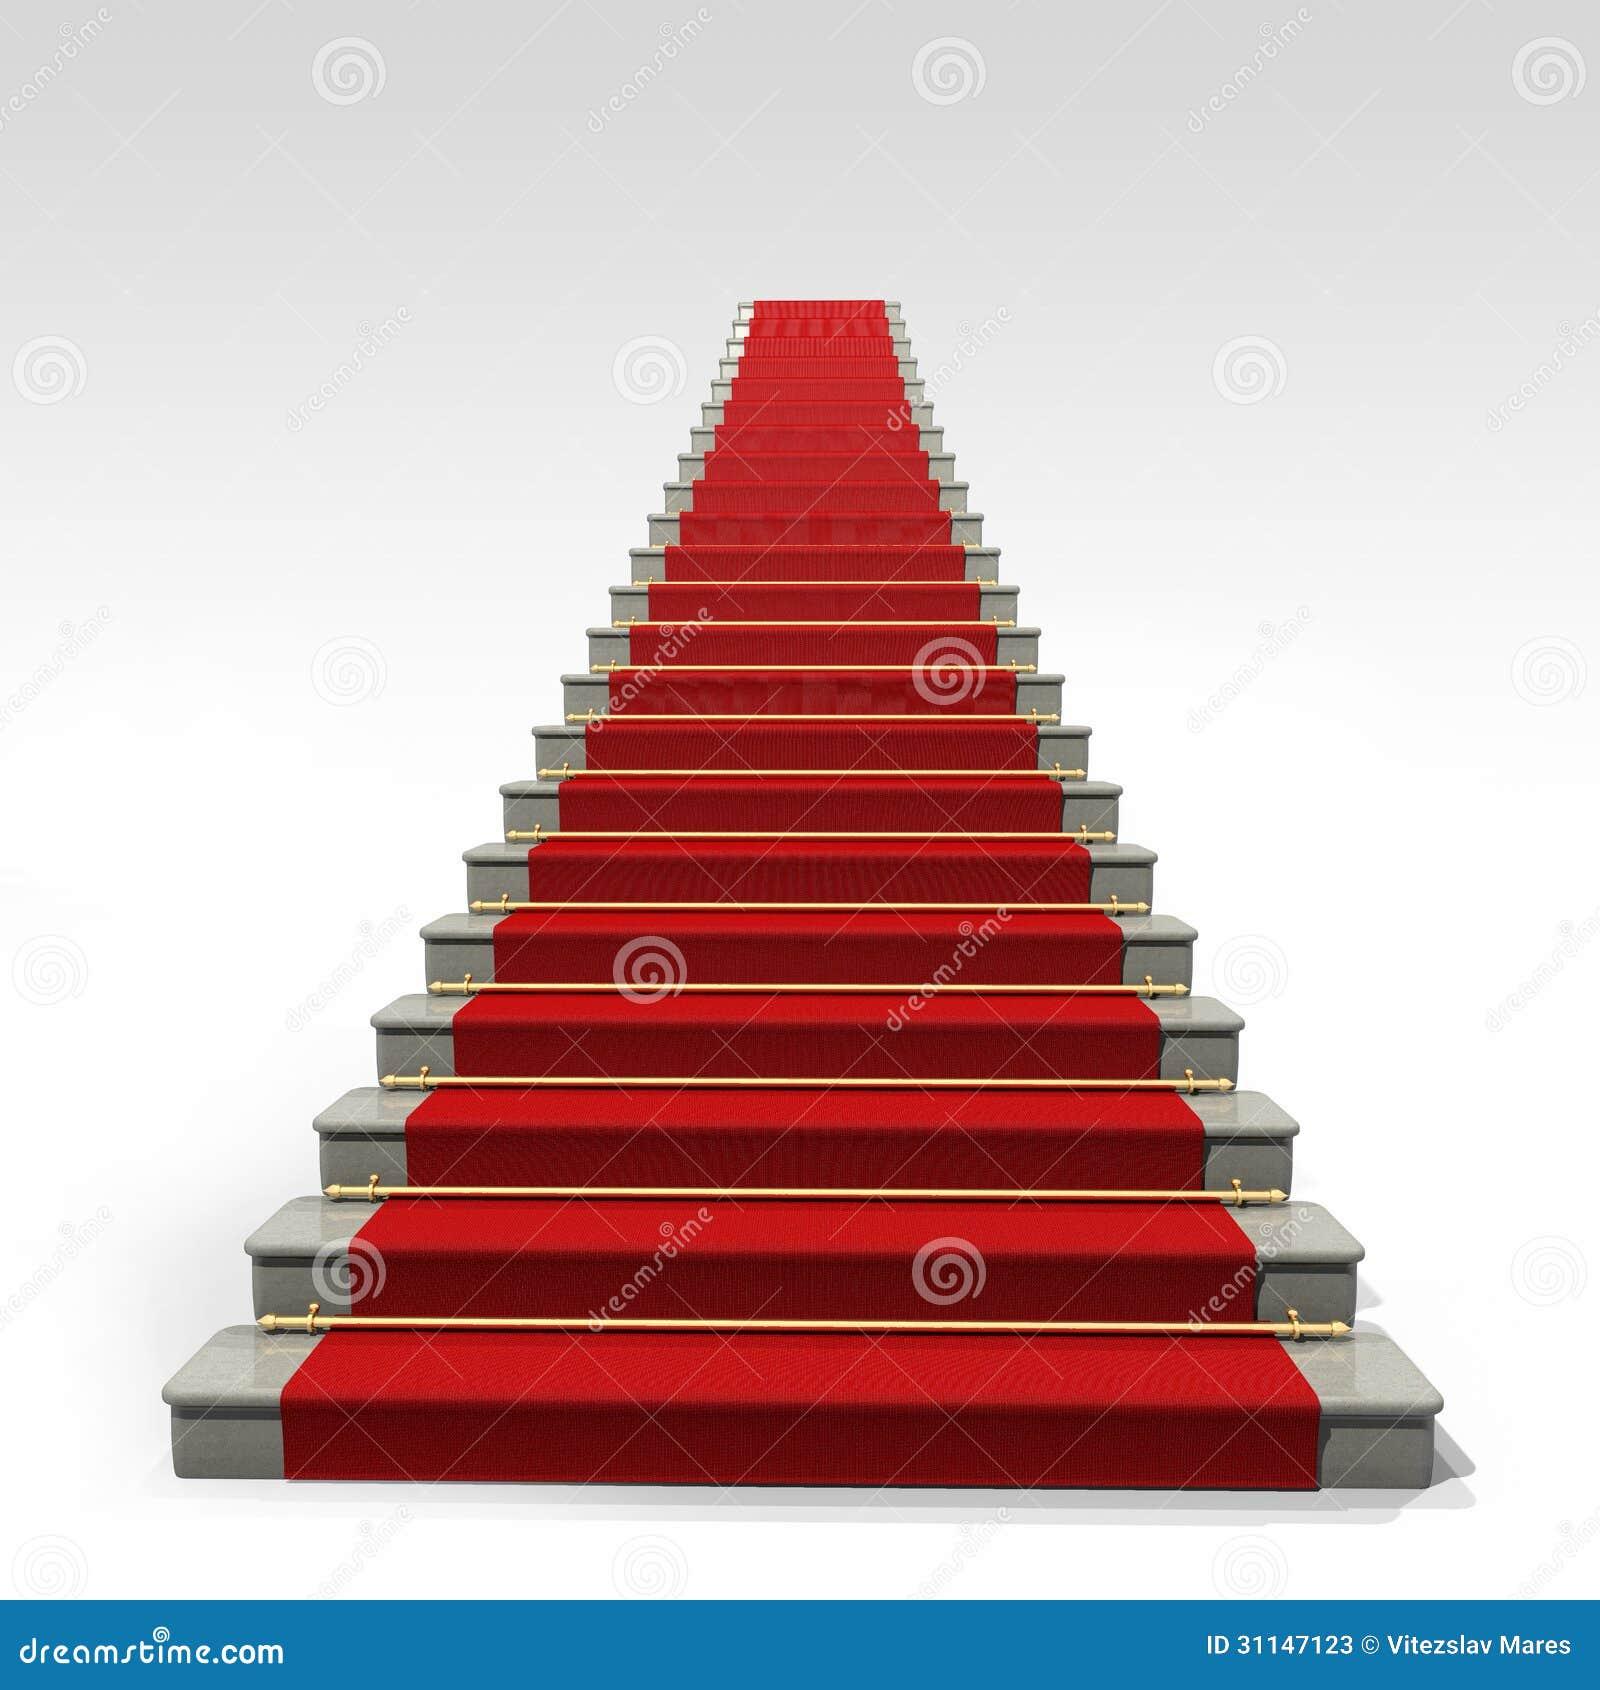 escaliers et tapis rouge photos stock image 31147123. Black Bedroom Furniture Sets. Home Design Ideas